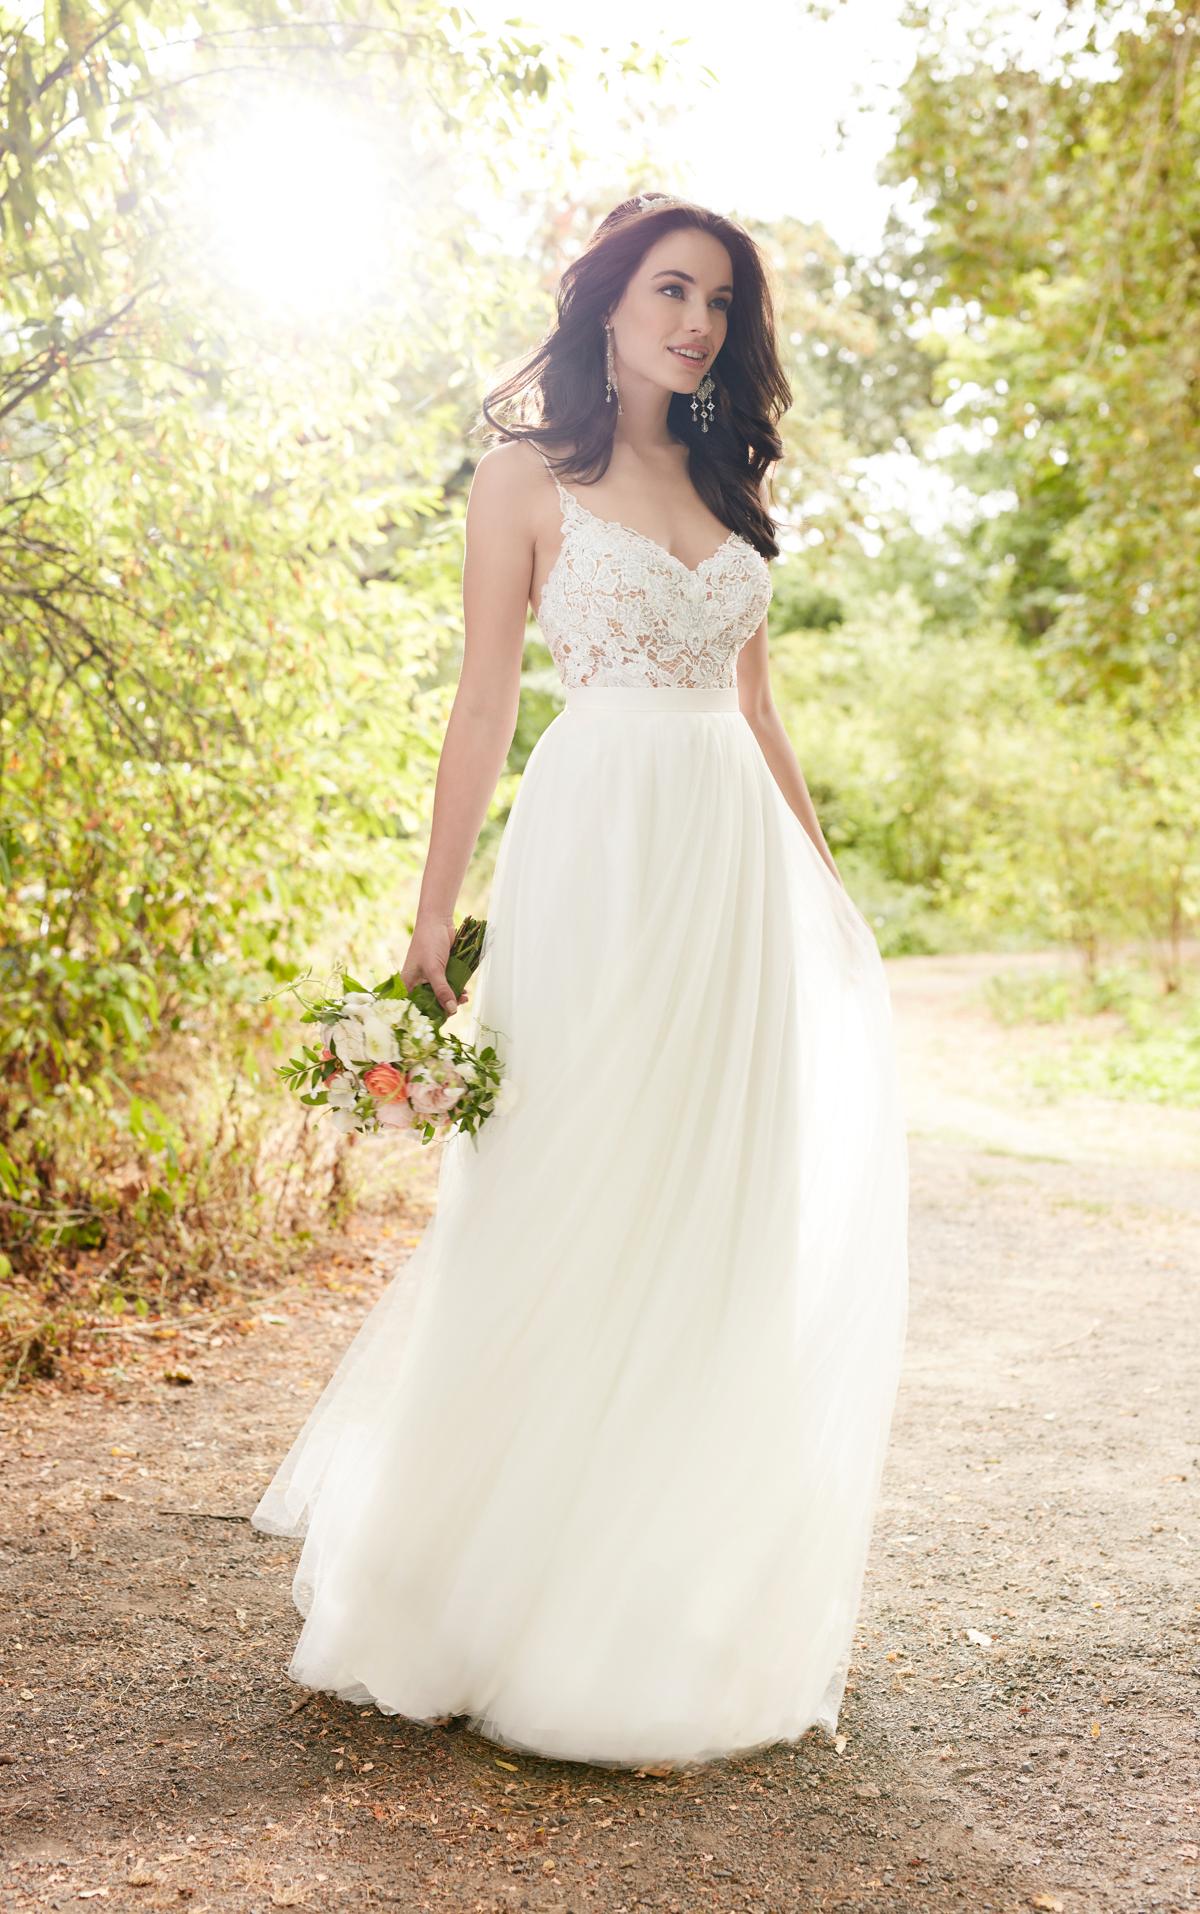 hippie style wedding dresses photo - 1